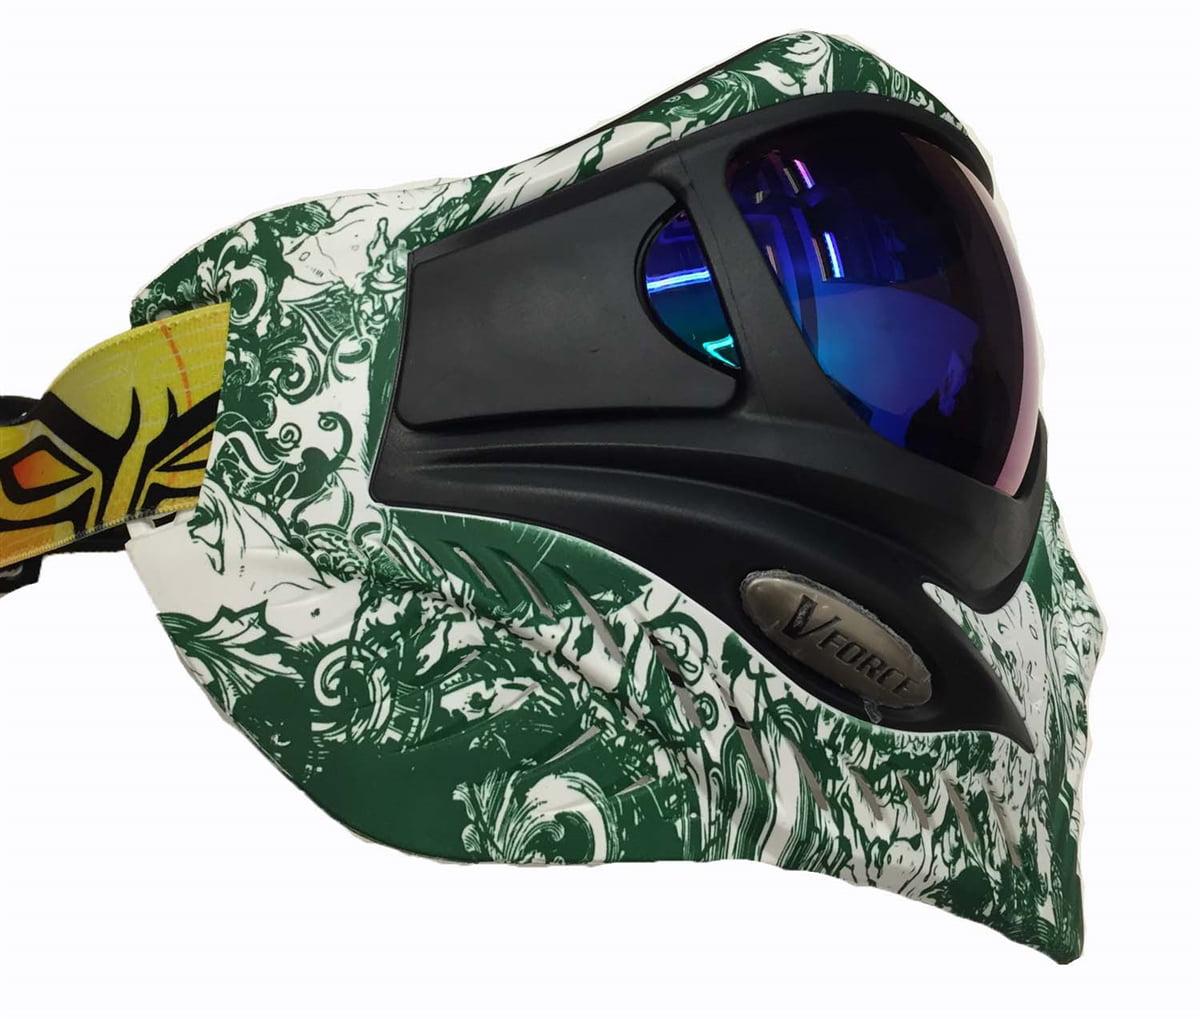 V Force Grill Paintball Mask Goggle Se Zombie Green Walmart Com Walmart Com